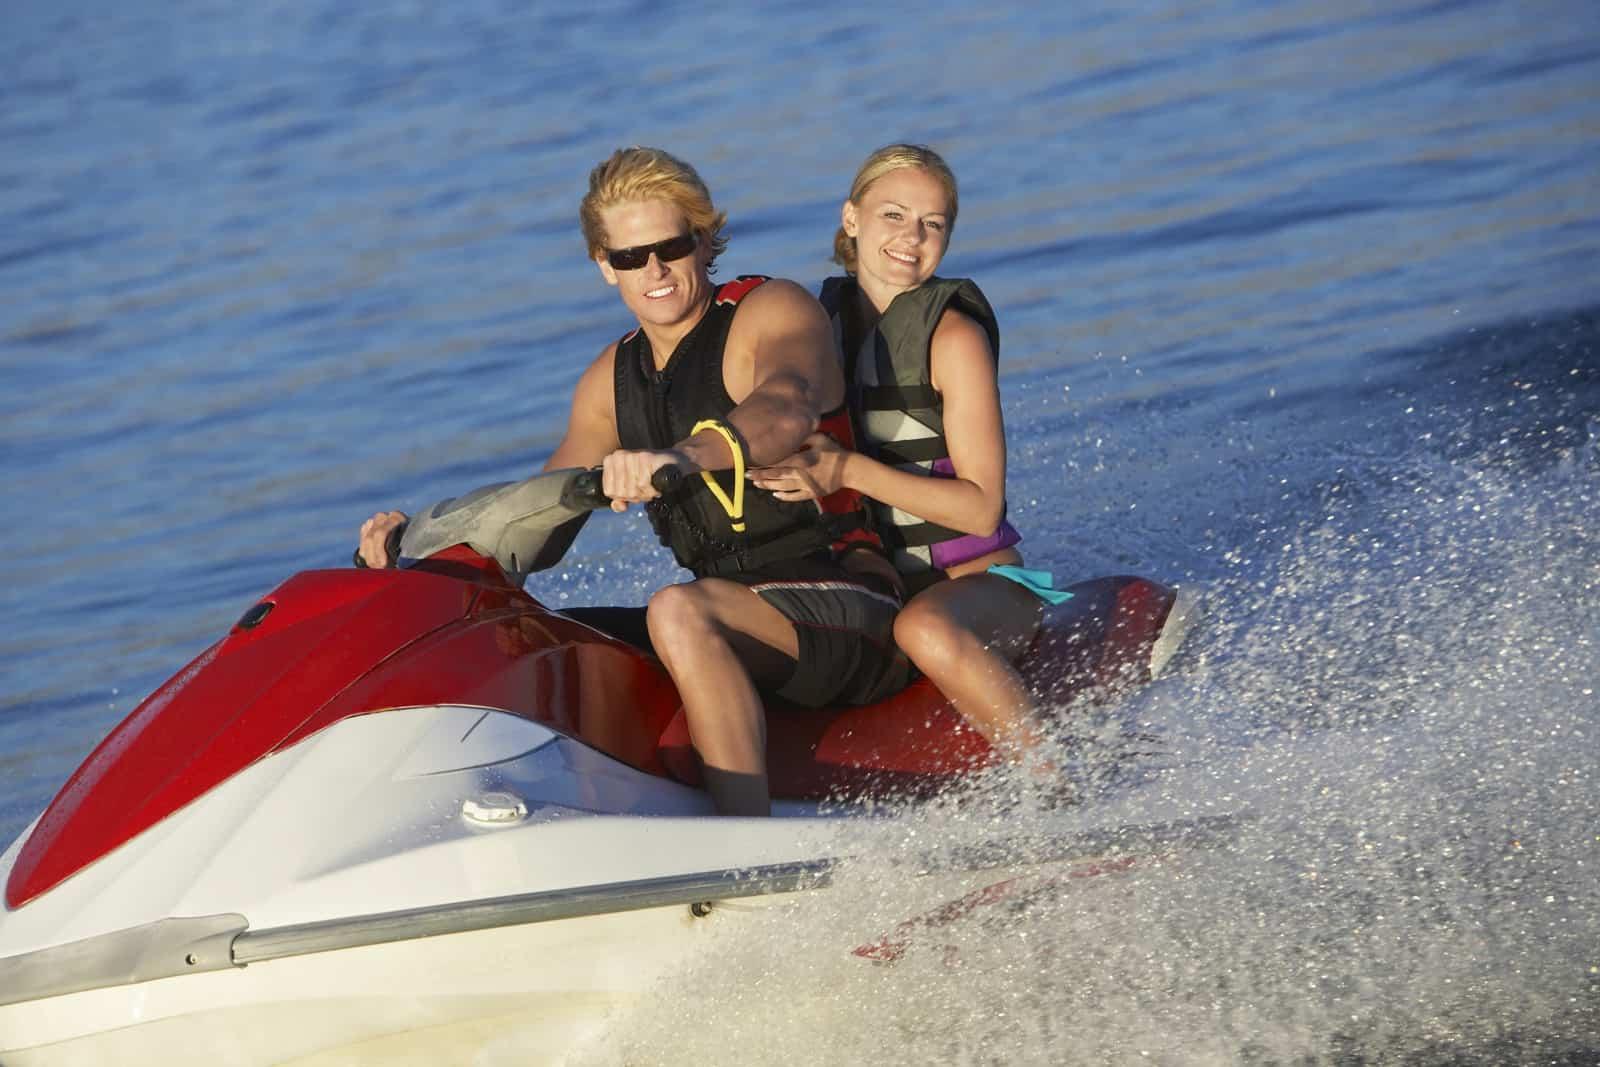 Happy couple riding jetski on Tampa Bay